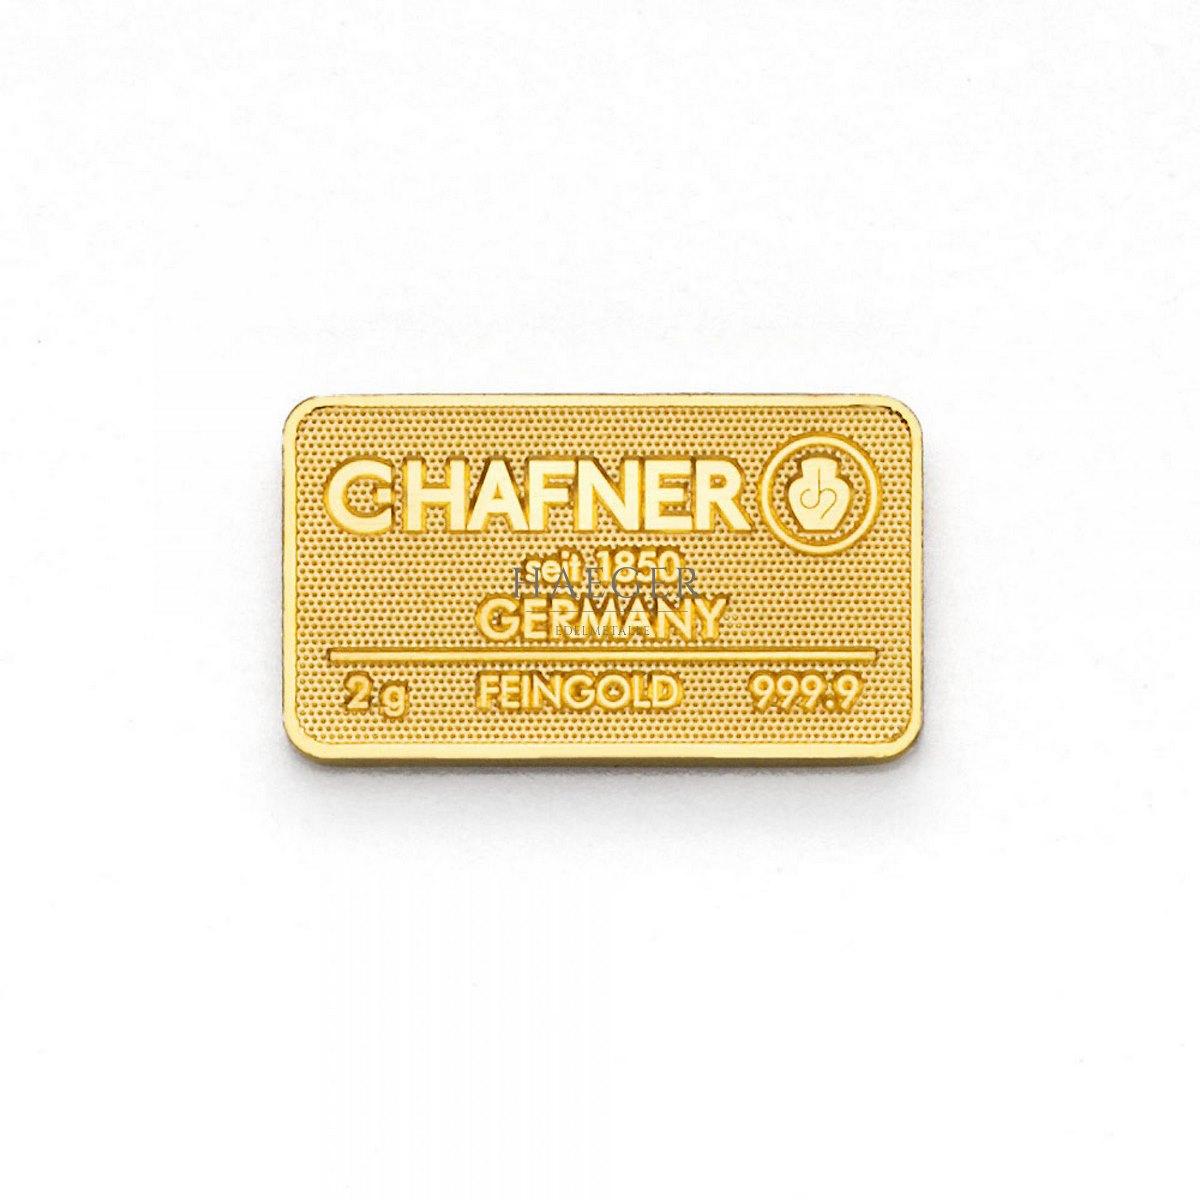 2g Goldbarren Hafner c